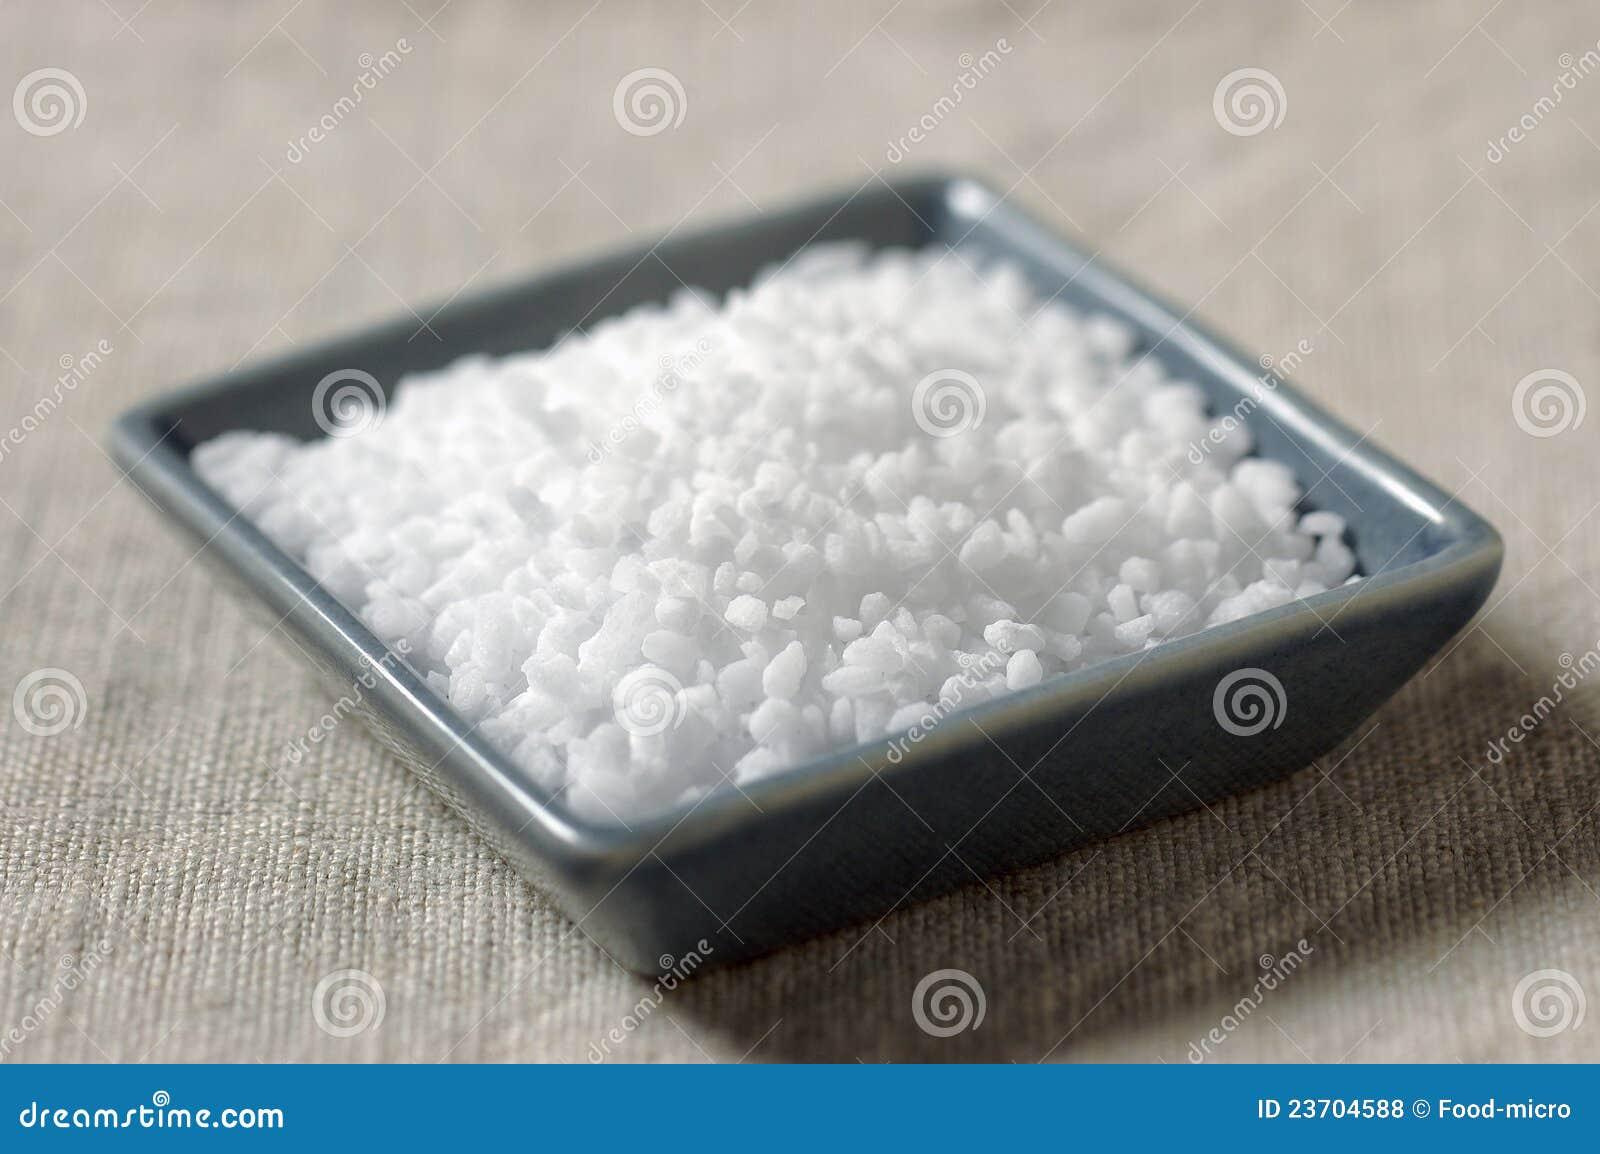 盐哺-m�f��dy.�9�b�/i_mr: no pr: no 0 351 0 盐 id 23704588 © food-micro